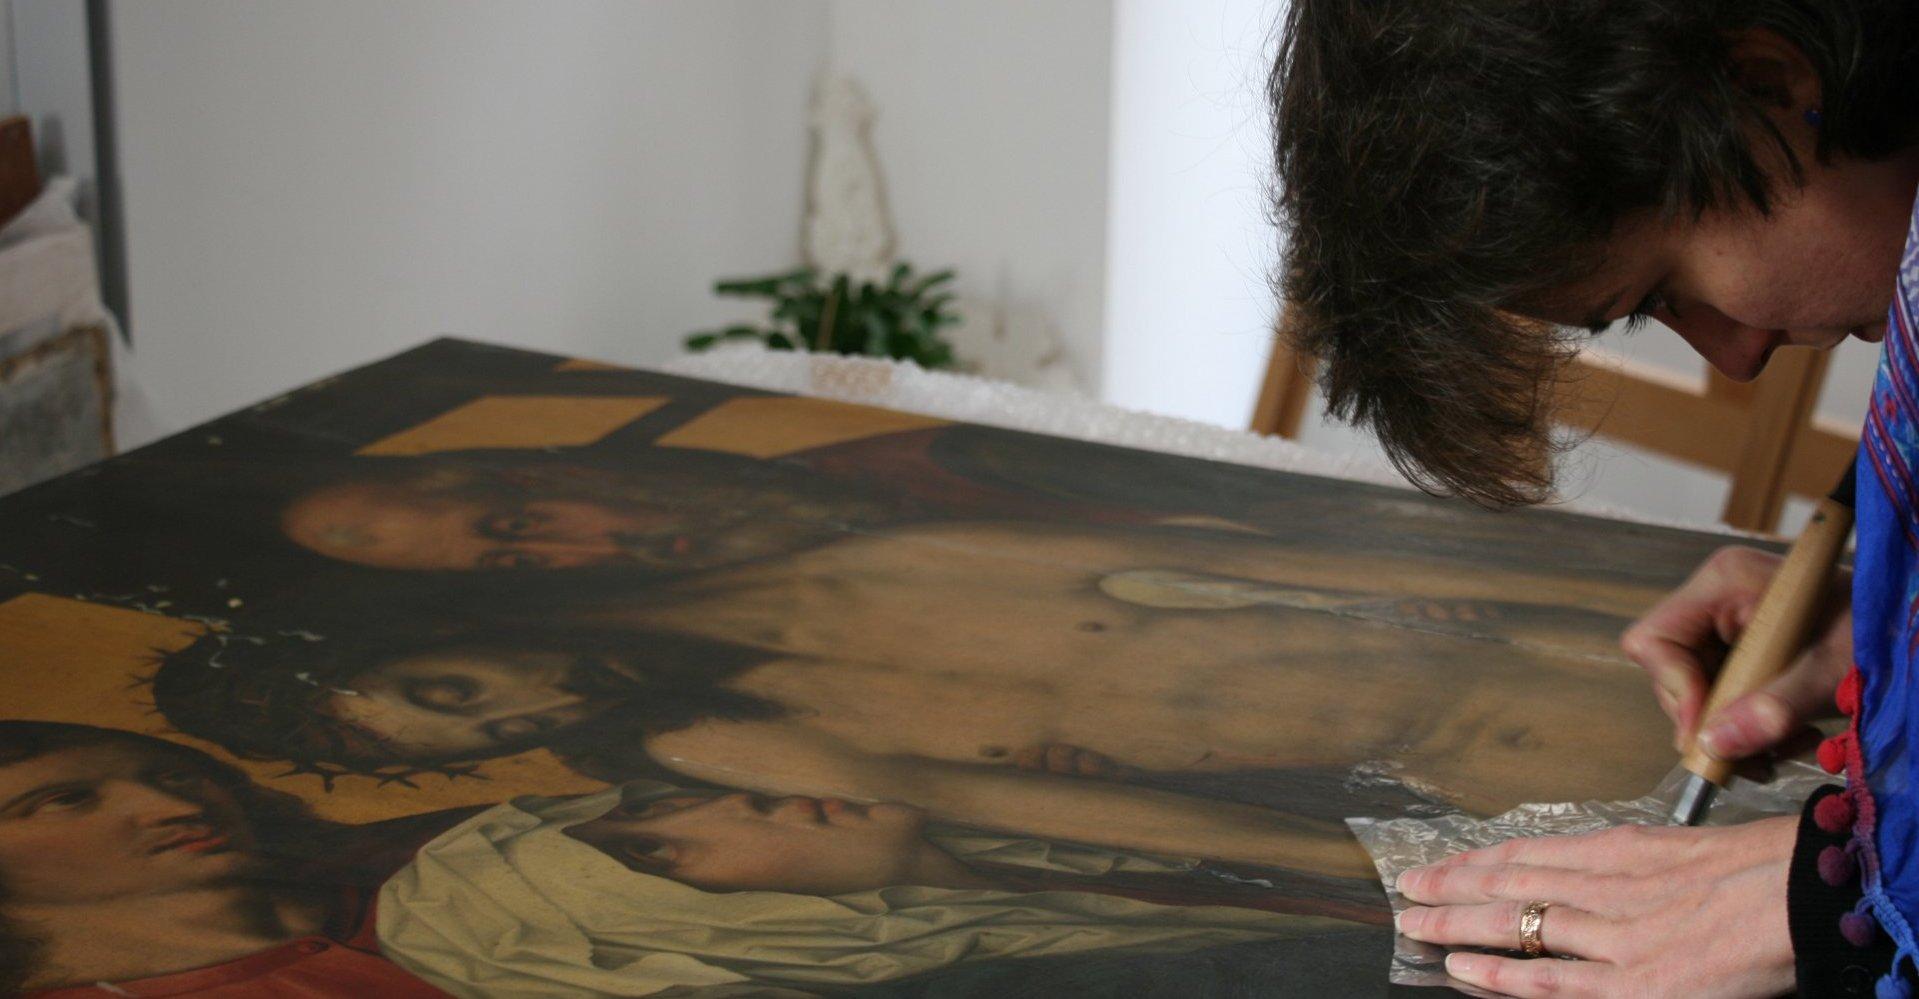 restauration-tableau-peinture-ancien-paris-slider2